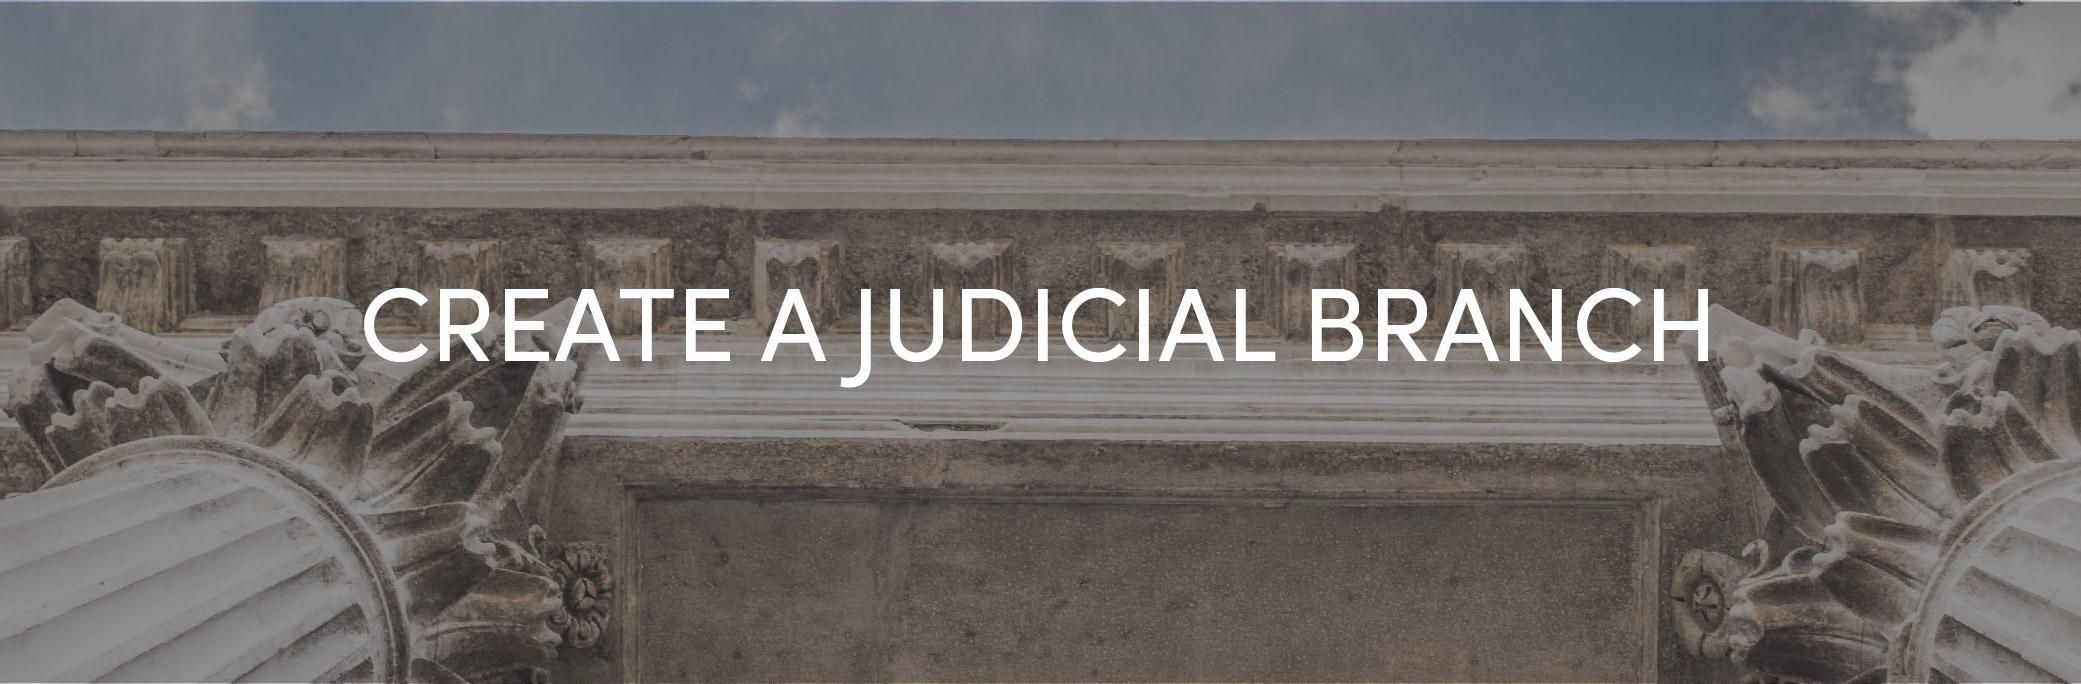 JudicialBranch